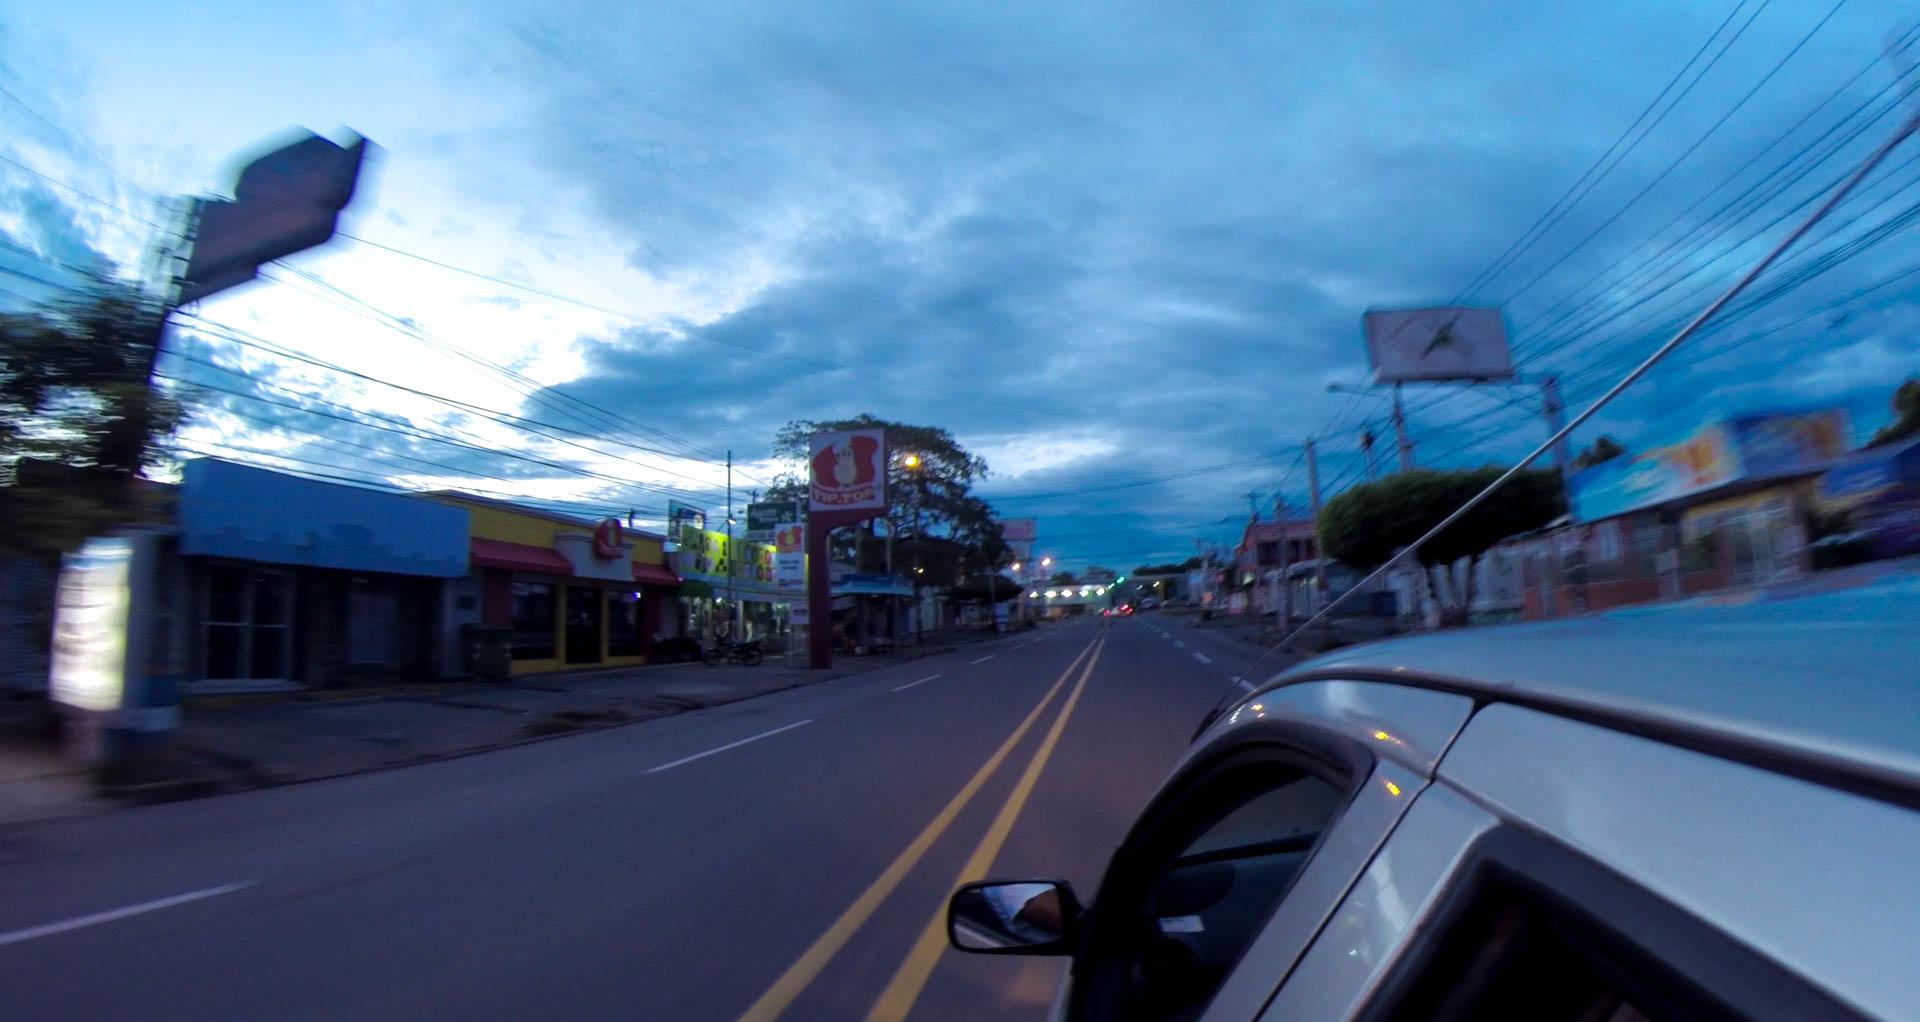 Arrival in Managuai - vdeo still, Tom Miller